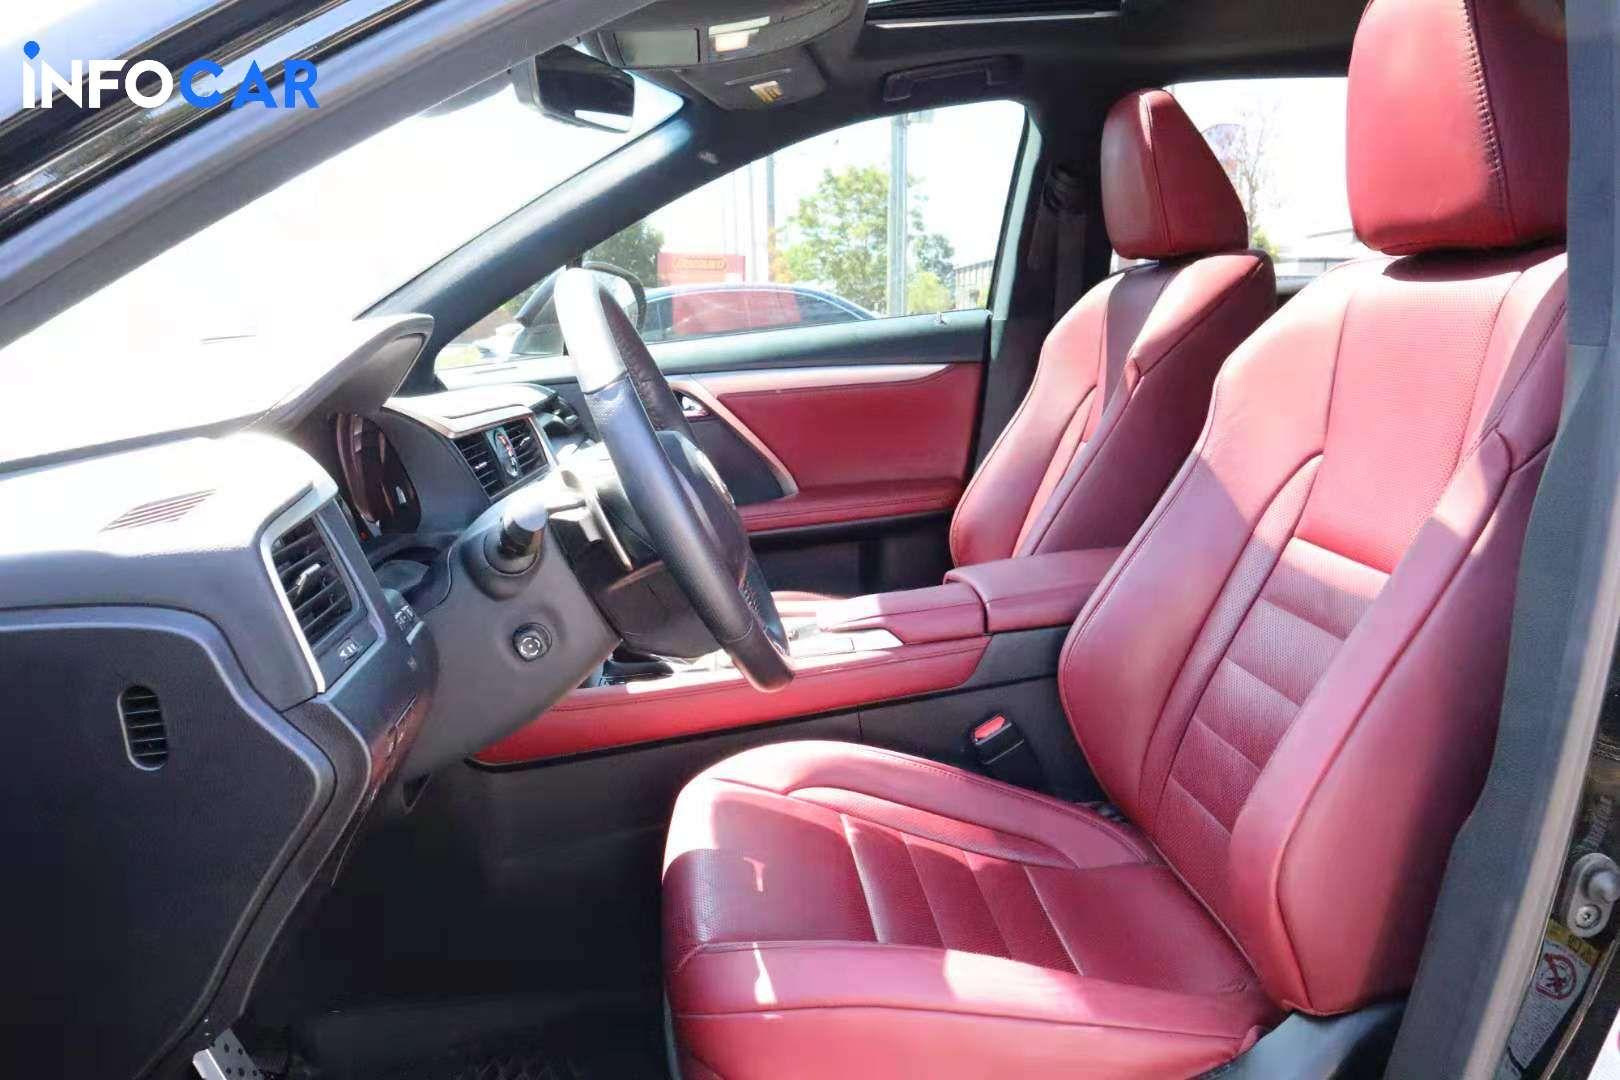 2019 Lexus RX 350 rx350 - INFOCAR - Toronto's Most Comprehensive New and Used Auto Trading Platform